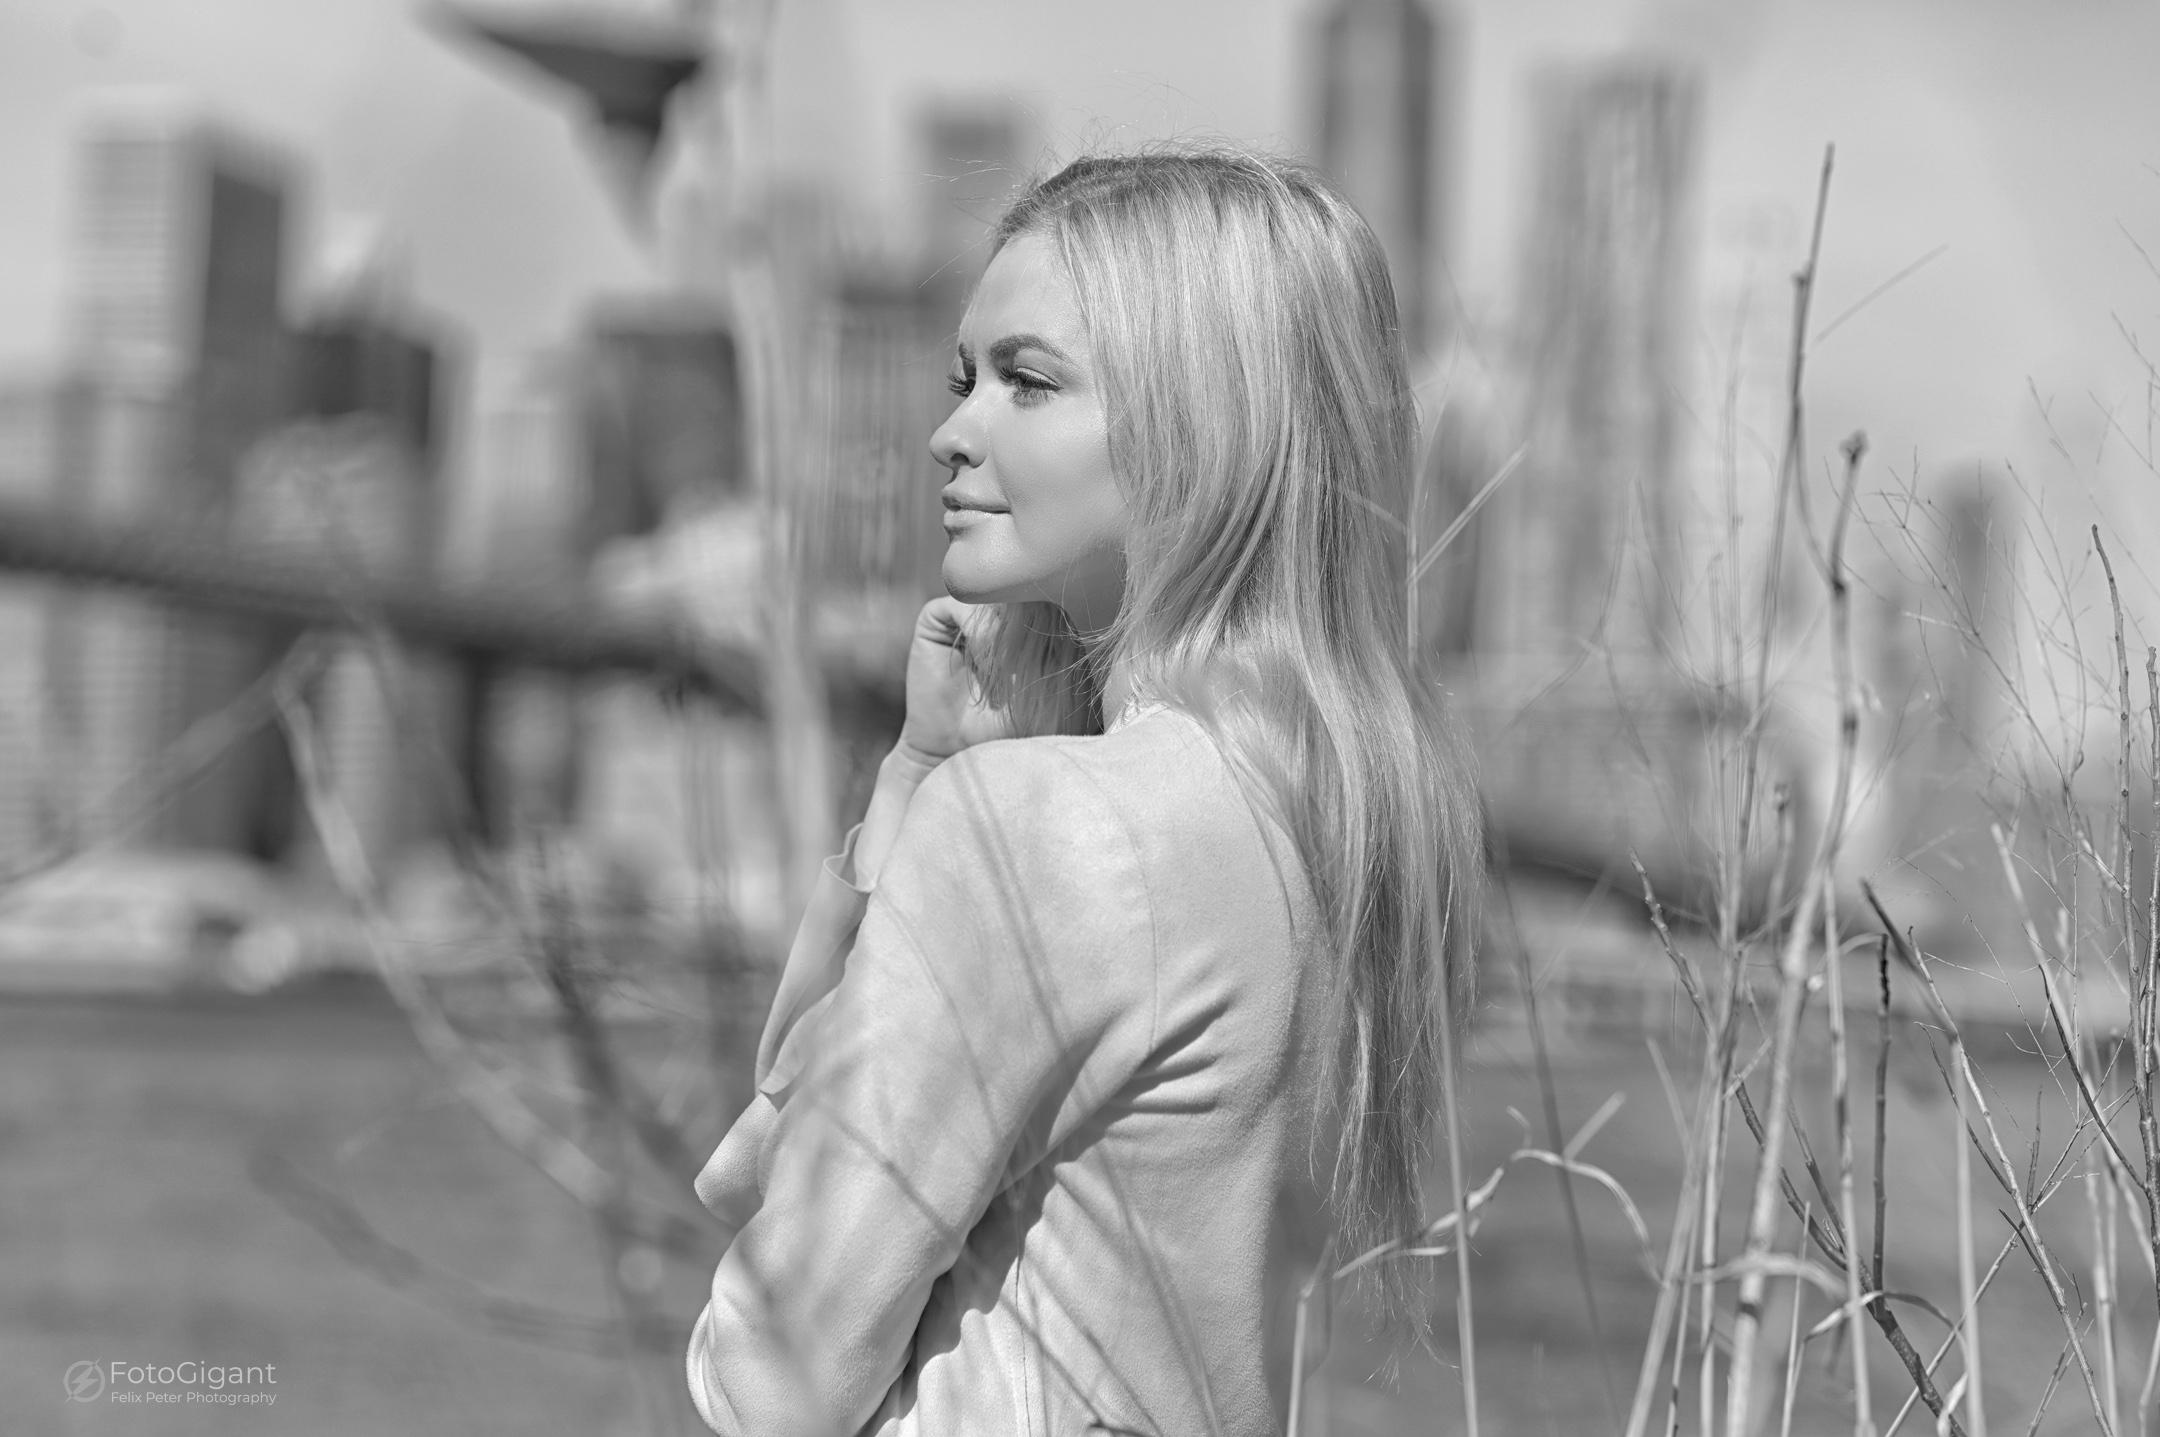 NewYork_JuliaKolomiyets_Fashionphotography_12.jpg